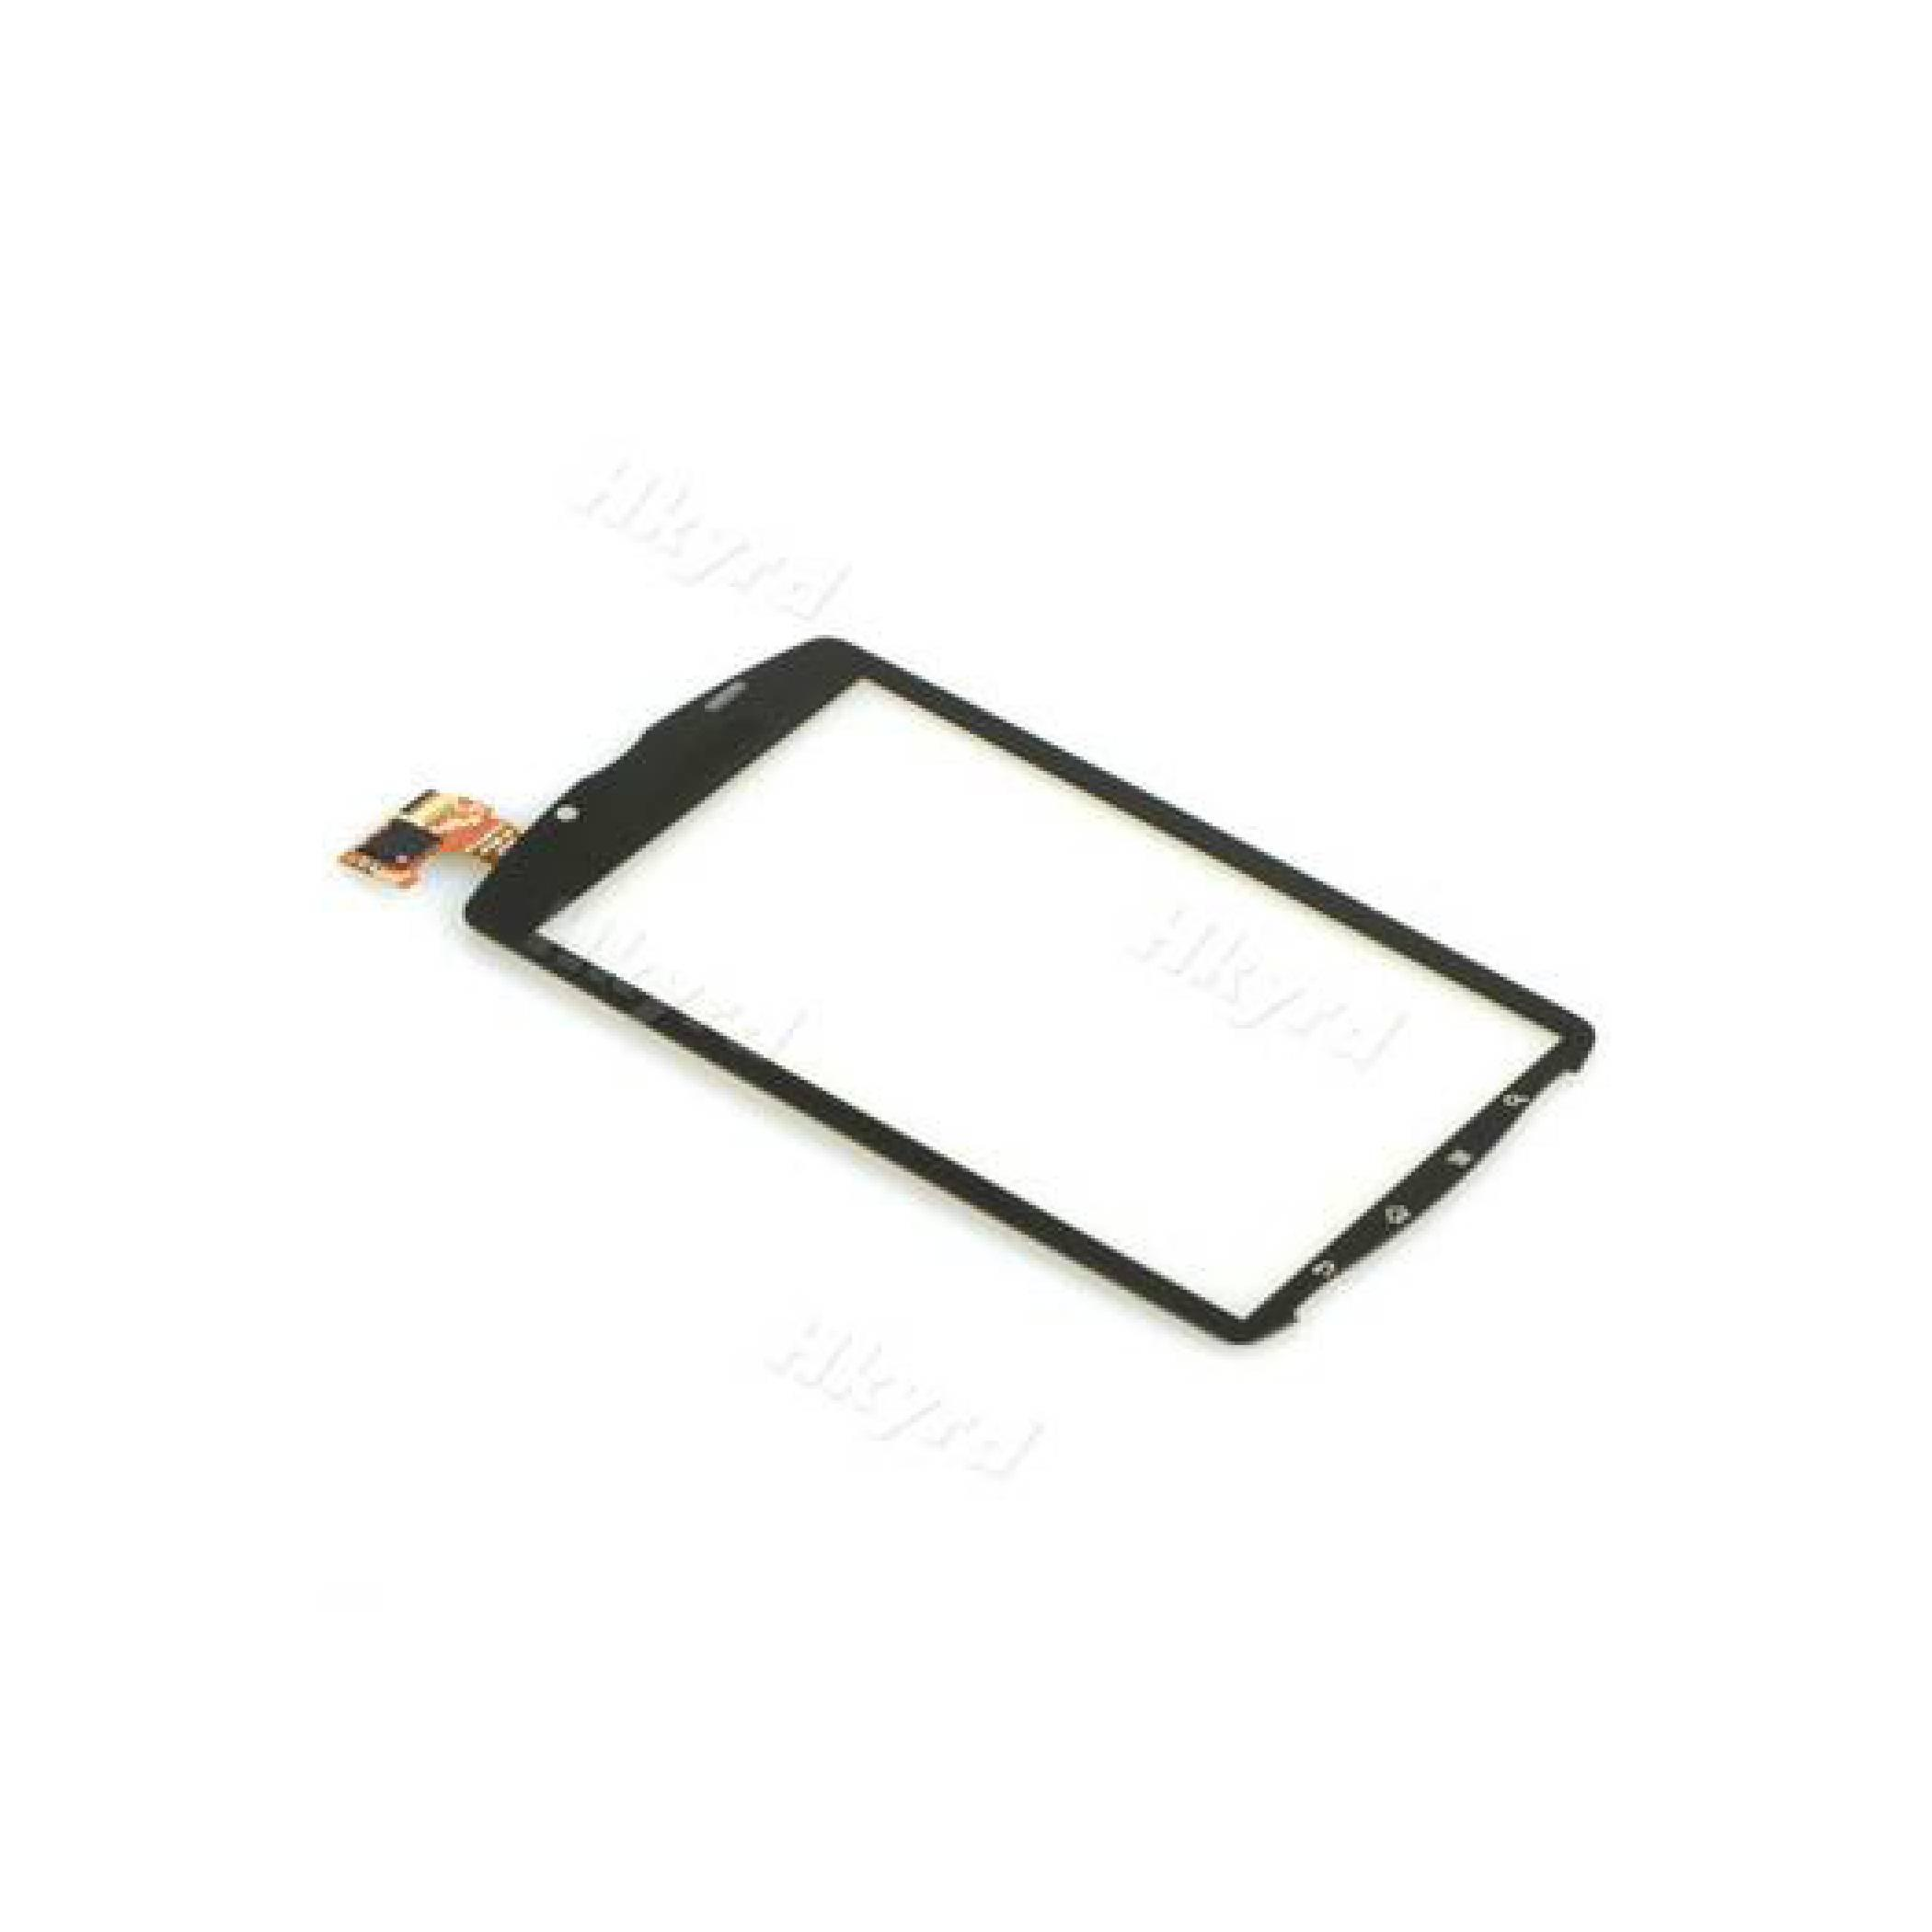 Touch Screen / Layar Sentuh Sony Experia Neo L MT25I